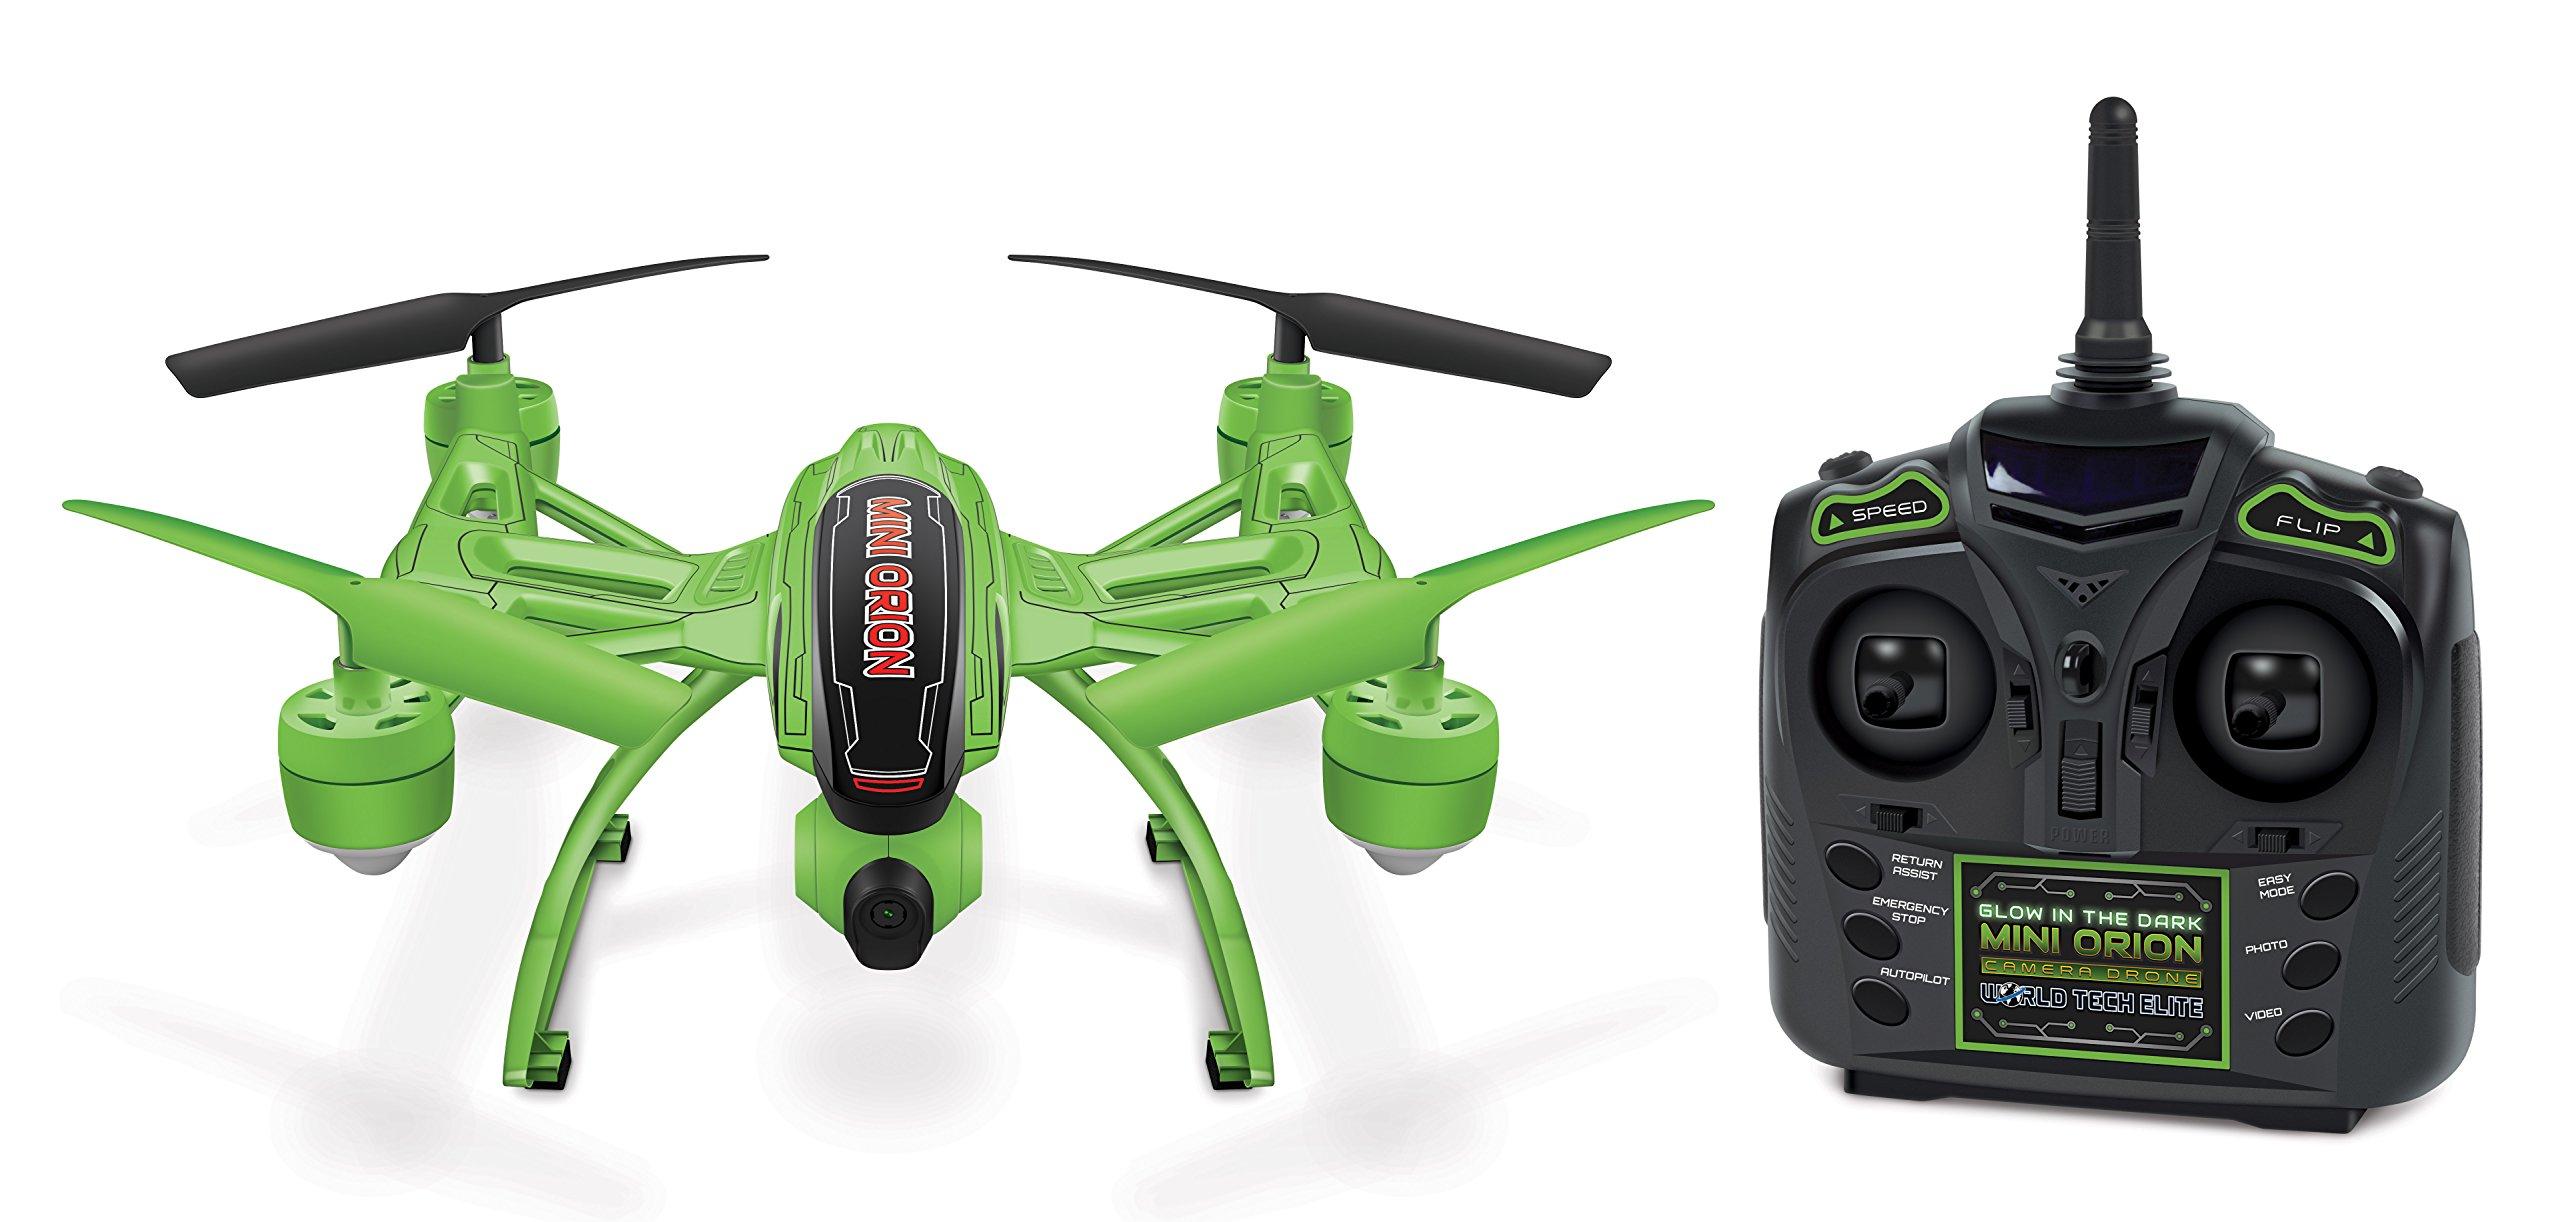 World Tech Toys Elite Mini Orion Glow- In-The-Dark Spy Drone 2.4GHz 4.5CH Picture/Video Camera RC Quadcopter, Glow In The Dark, 12 x 7.75 x 4.25